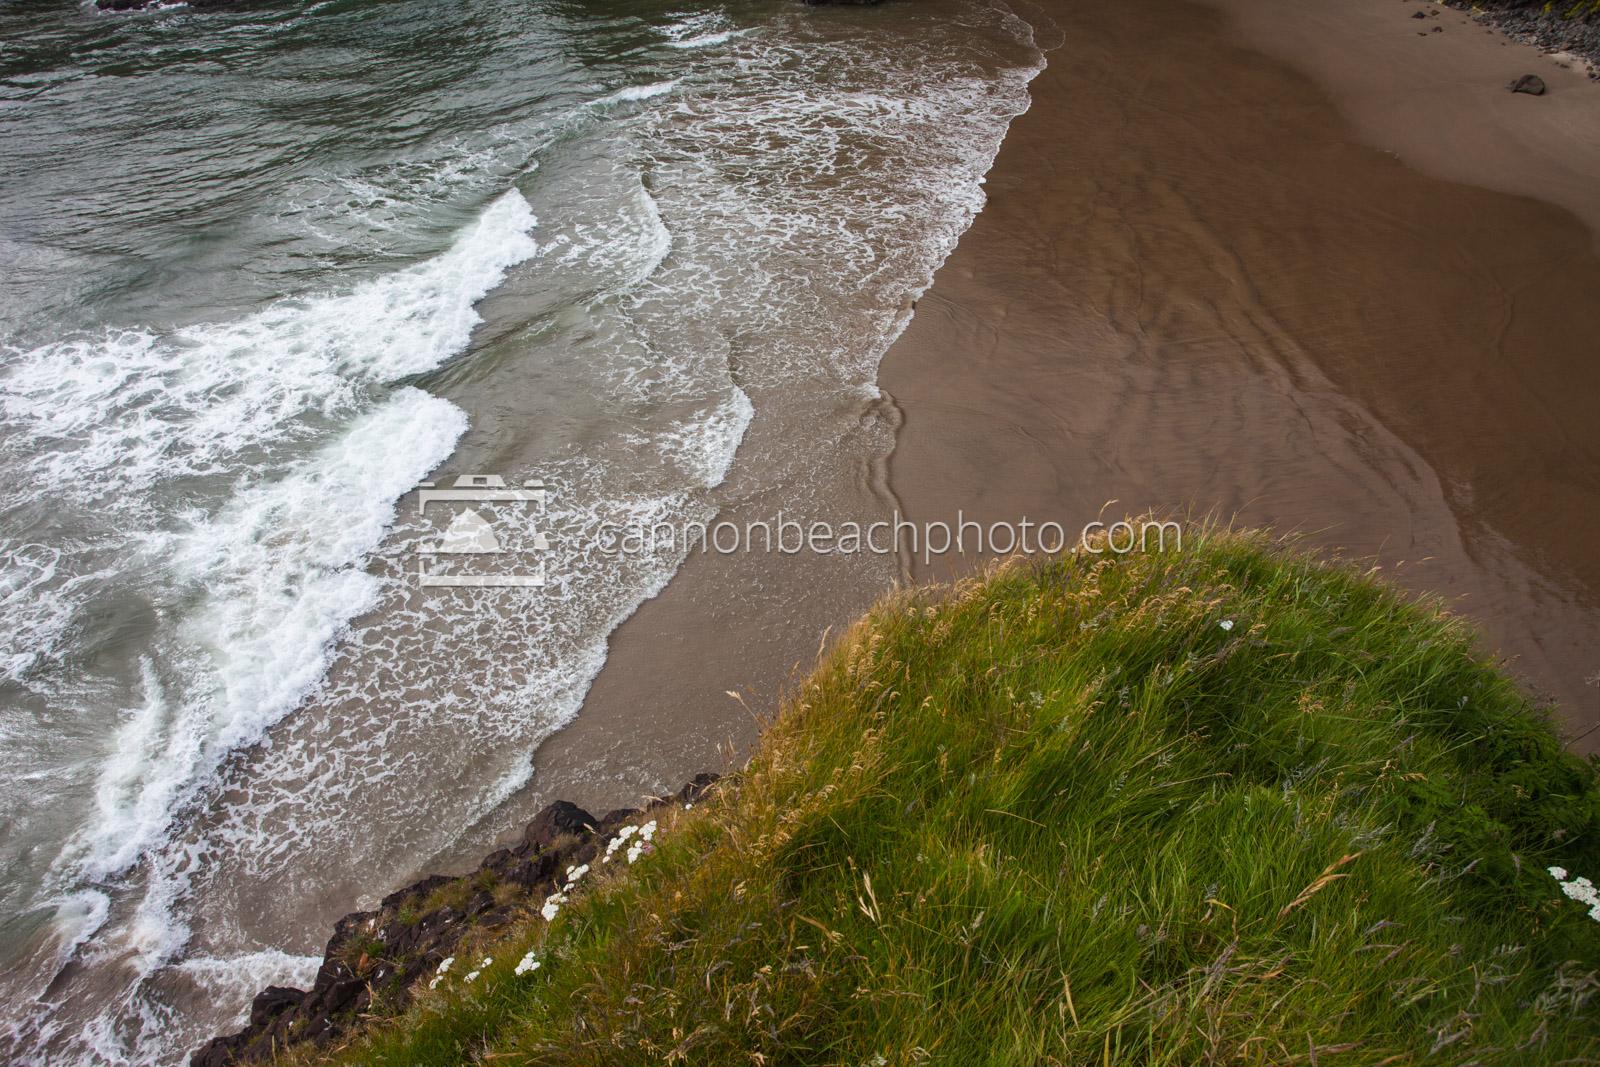 Grass Tuft and Ocean Below